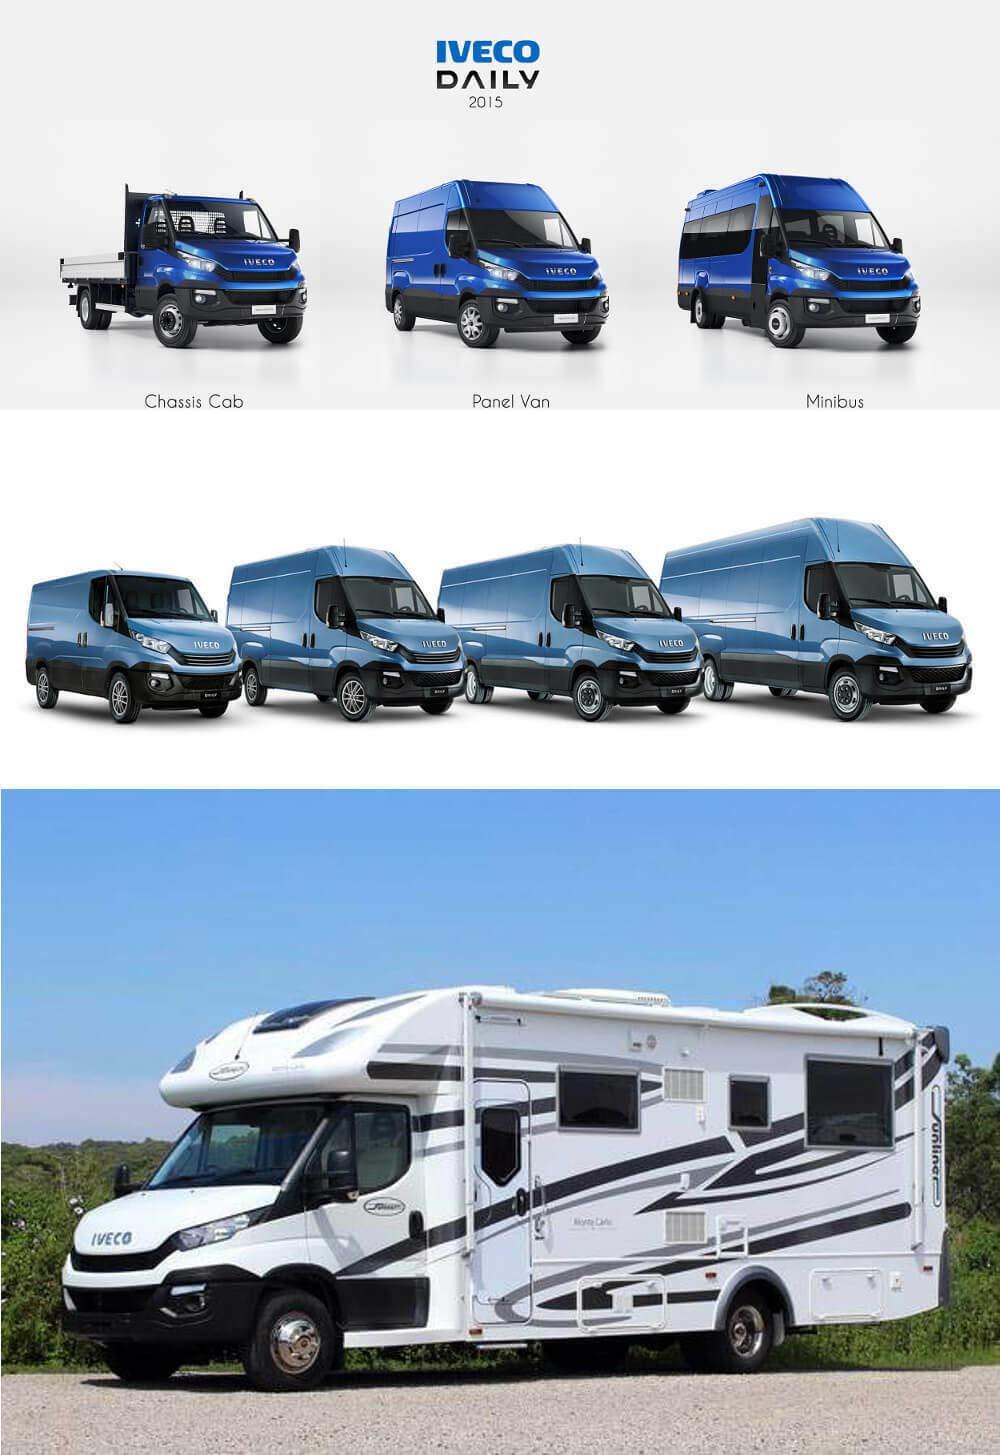 RIGUM903928 Furgoni e Camper Iveco Daily dal 2014